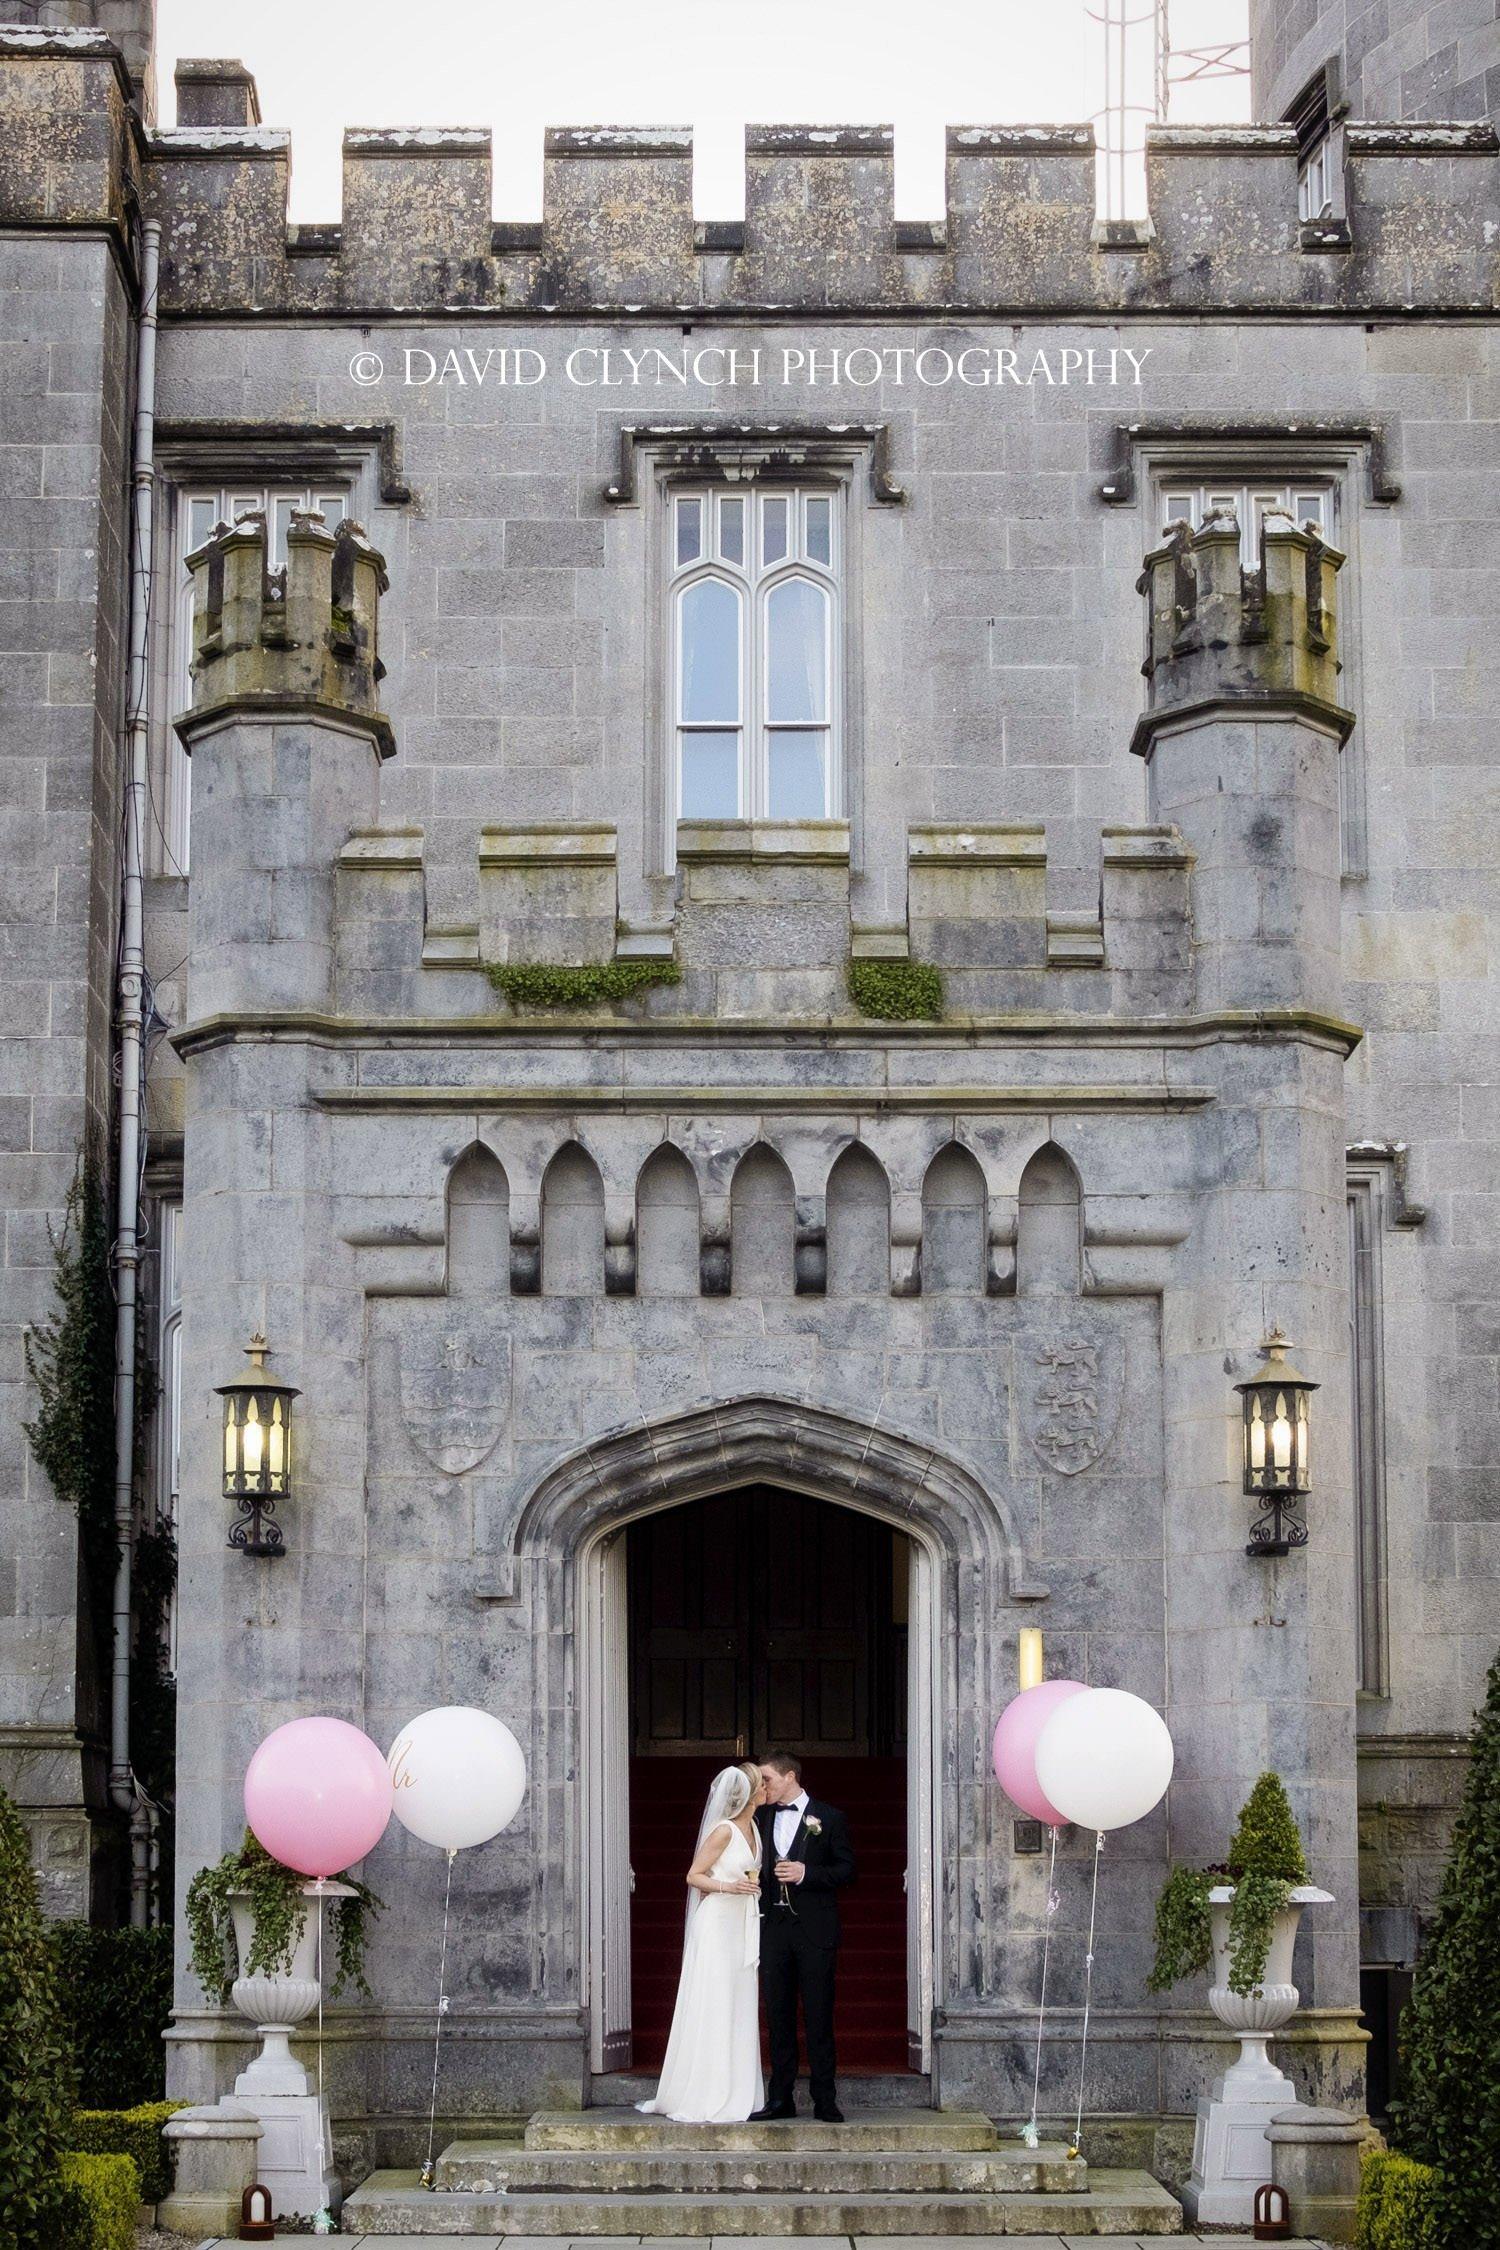 Wedding Photography Dromoland Castle Clare Ireland